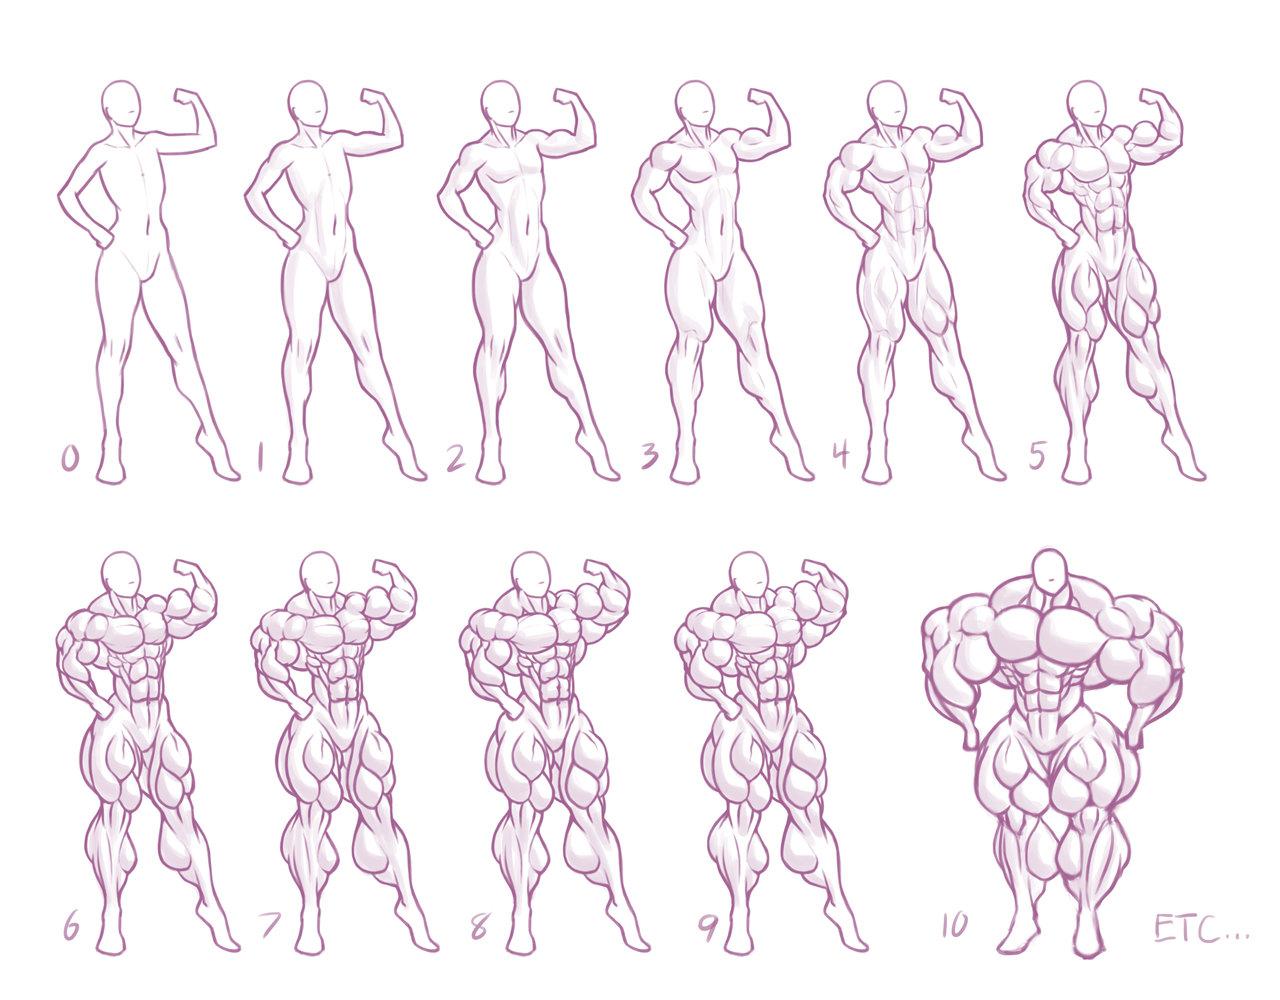 Drawn women muscular Muscular Anatomy Search Google Search